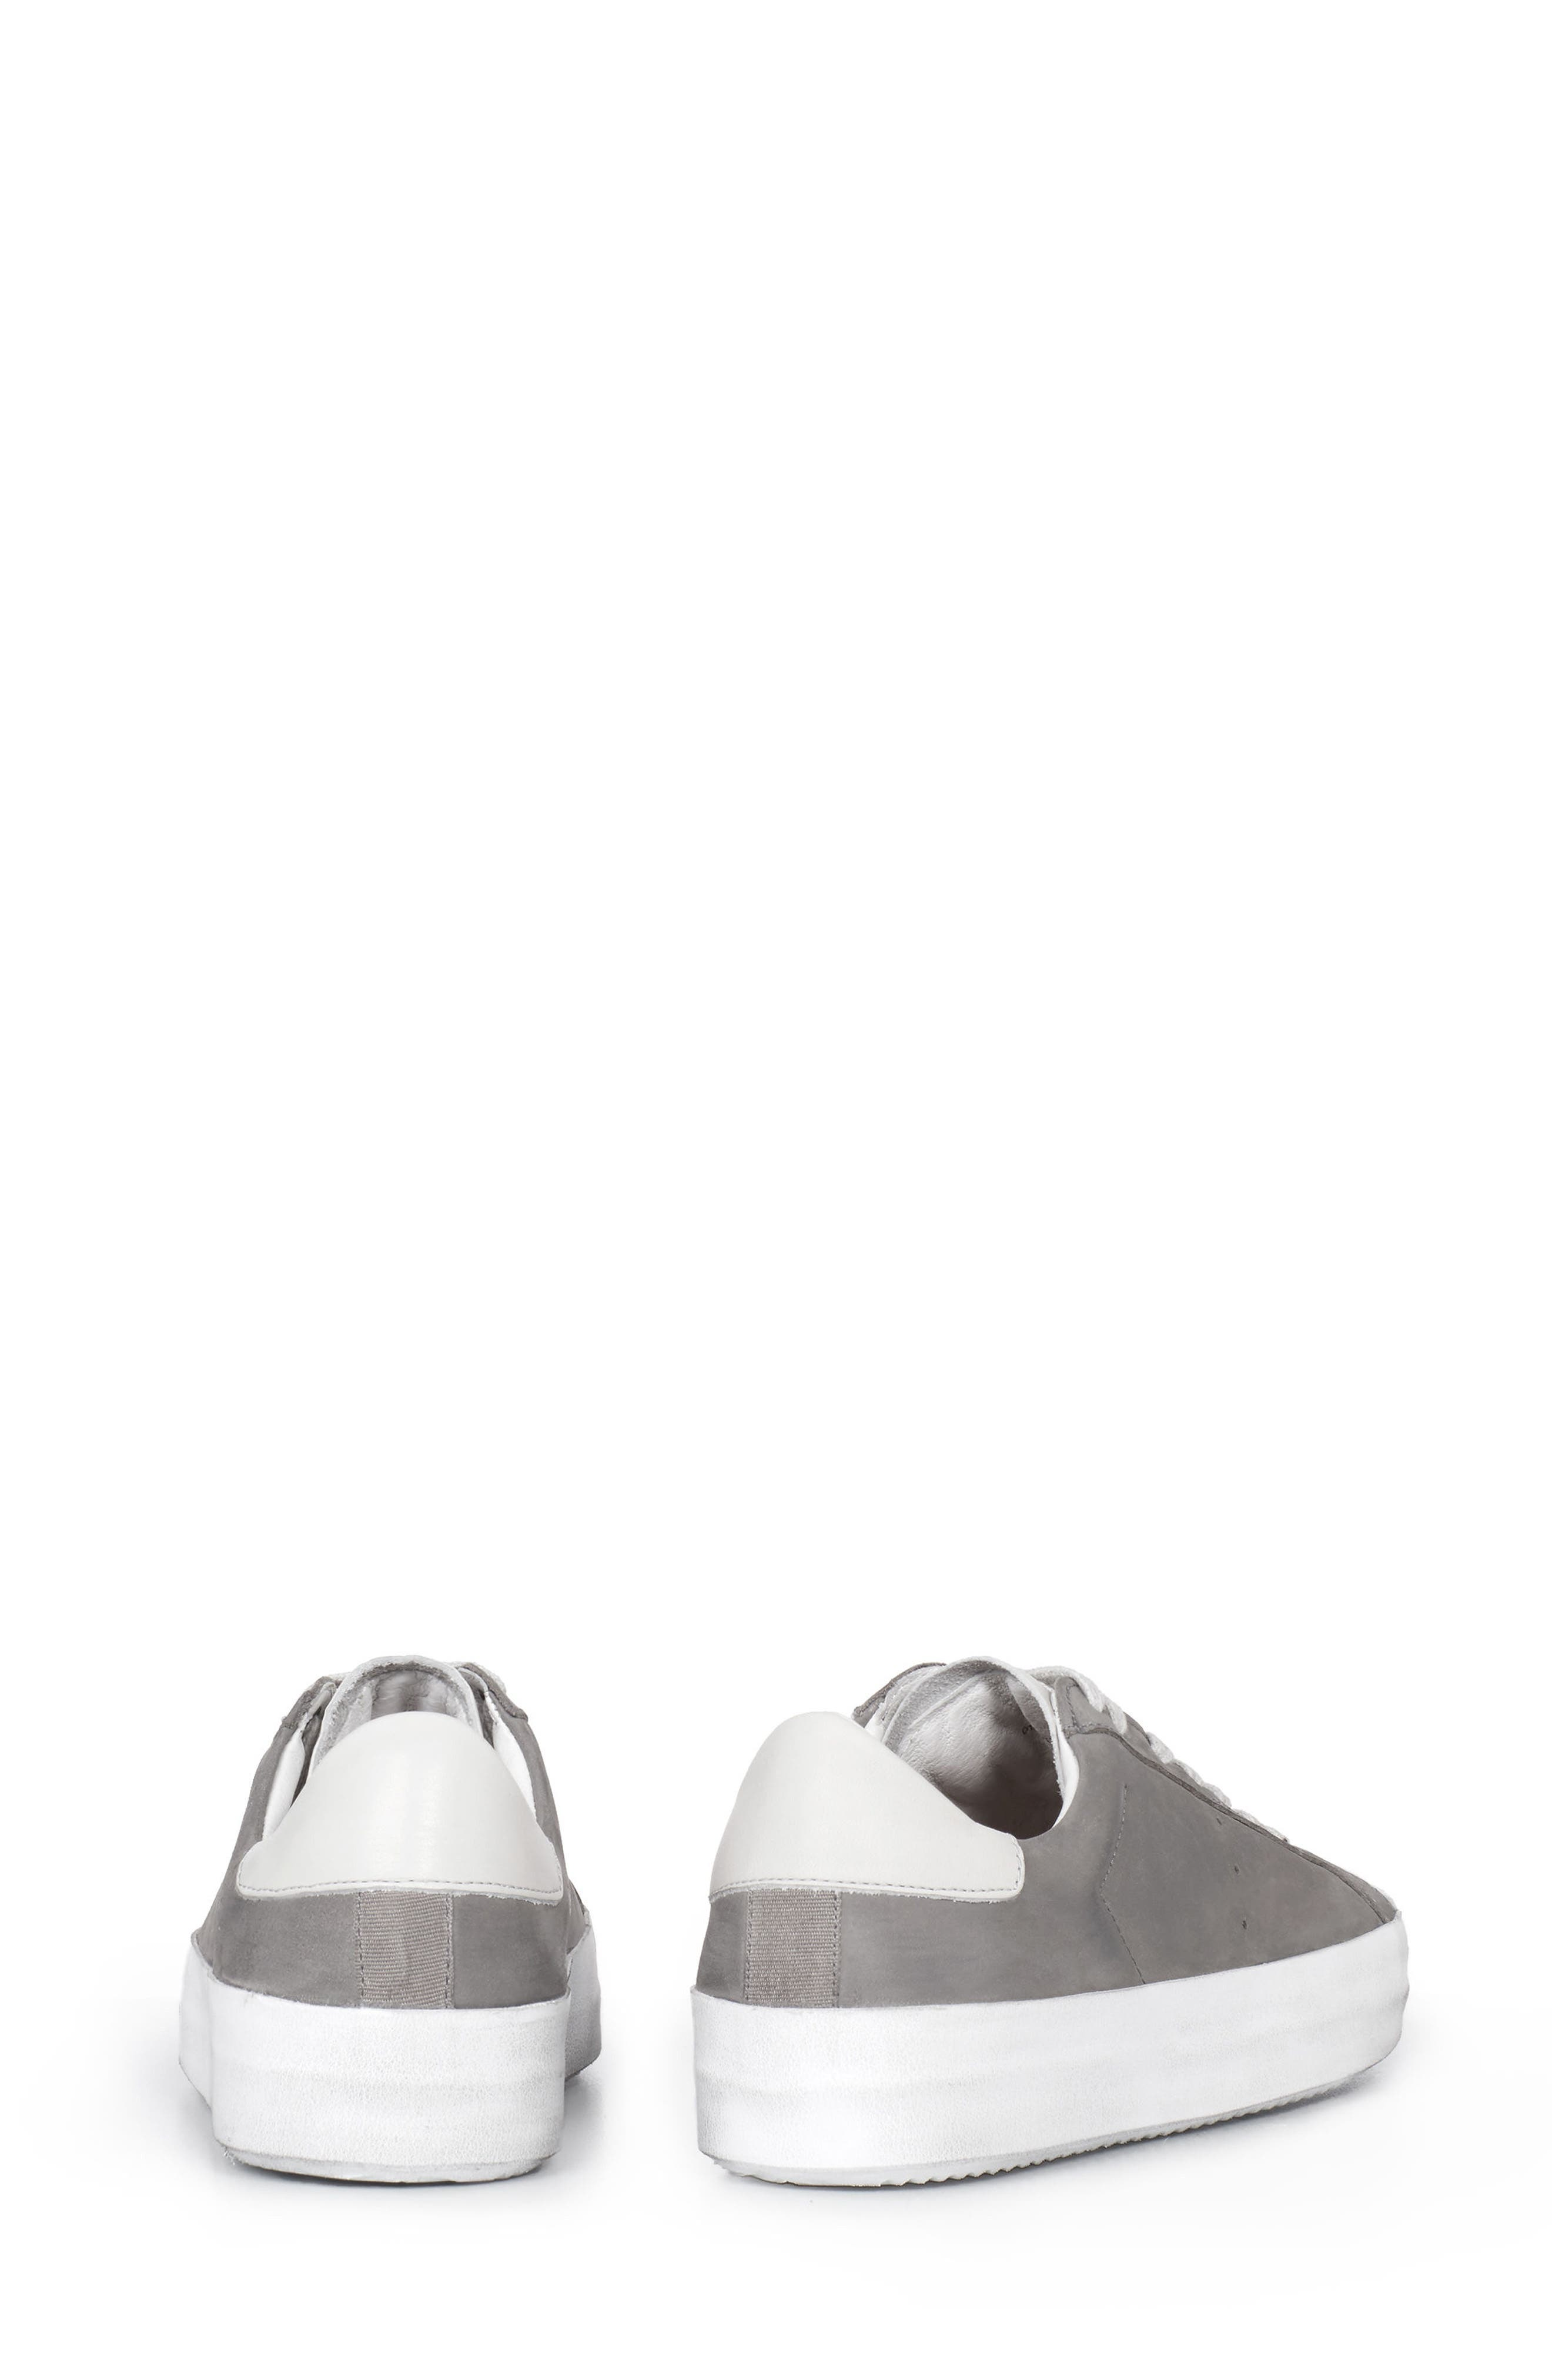 Safia Sneaker,                             Alternate thumbnail 2, color,                             020